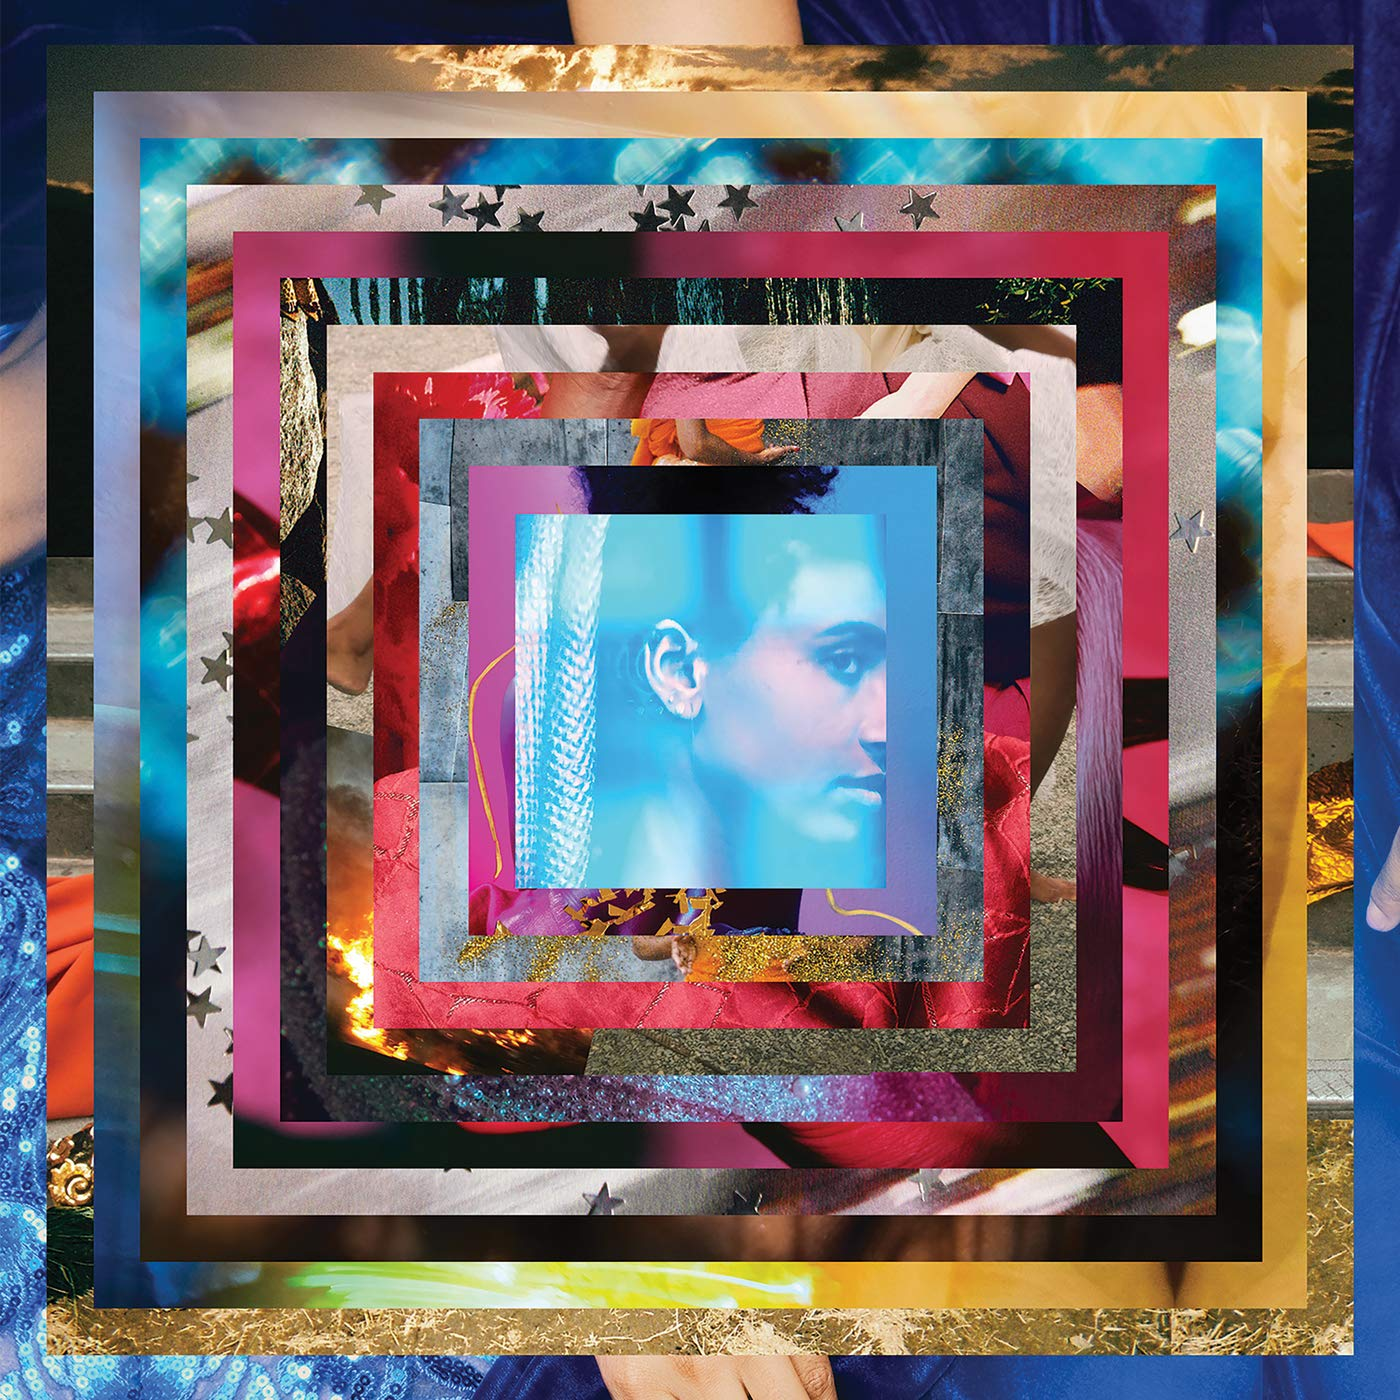 лучшая цена Esperanza Spalding. 12 Little Spells (2 LP)